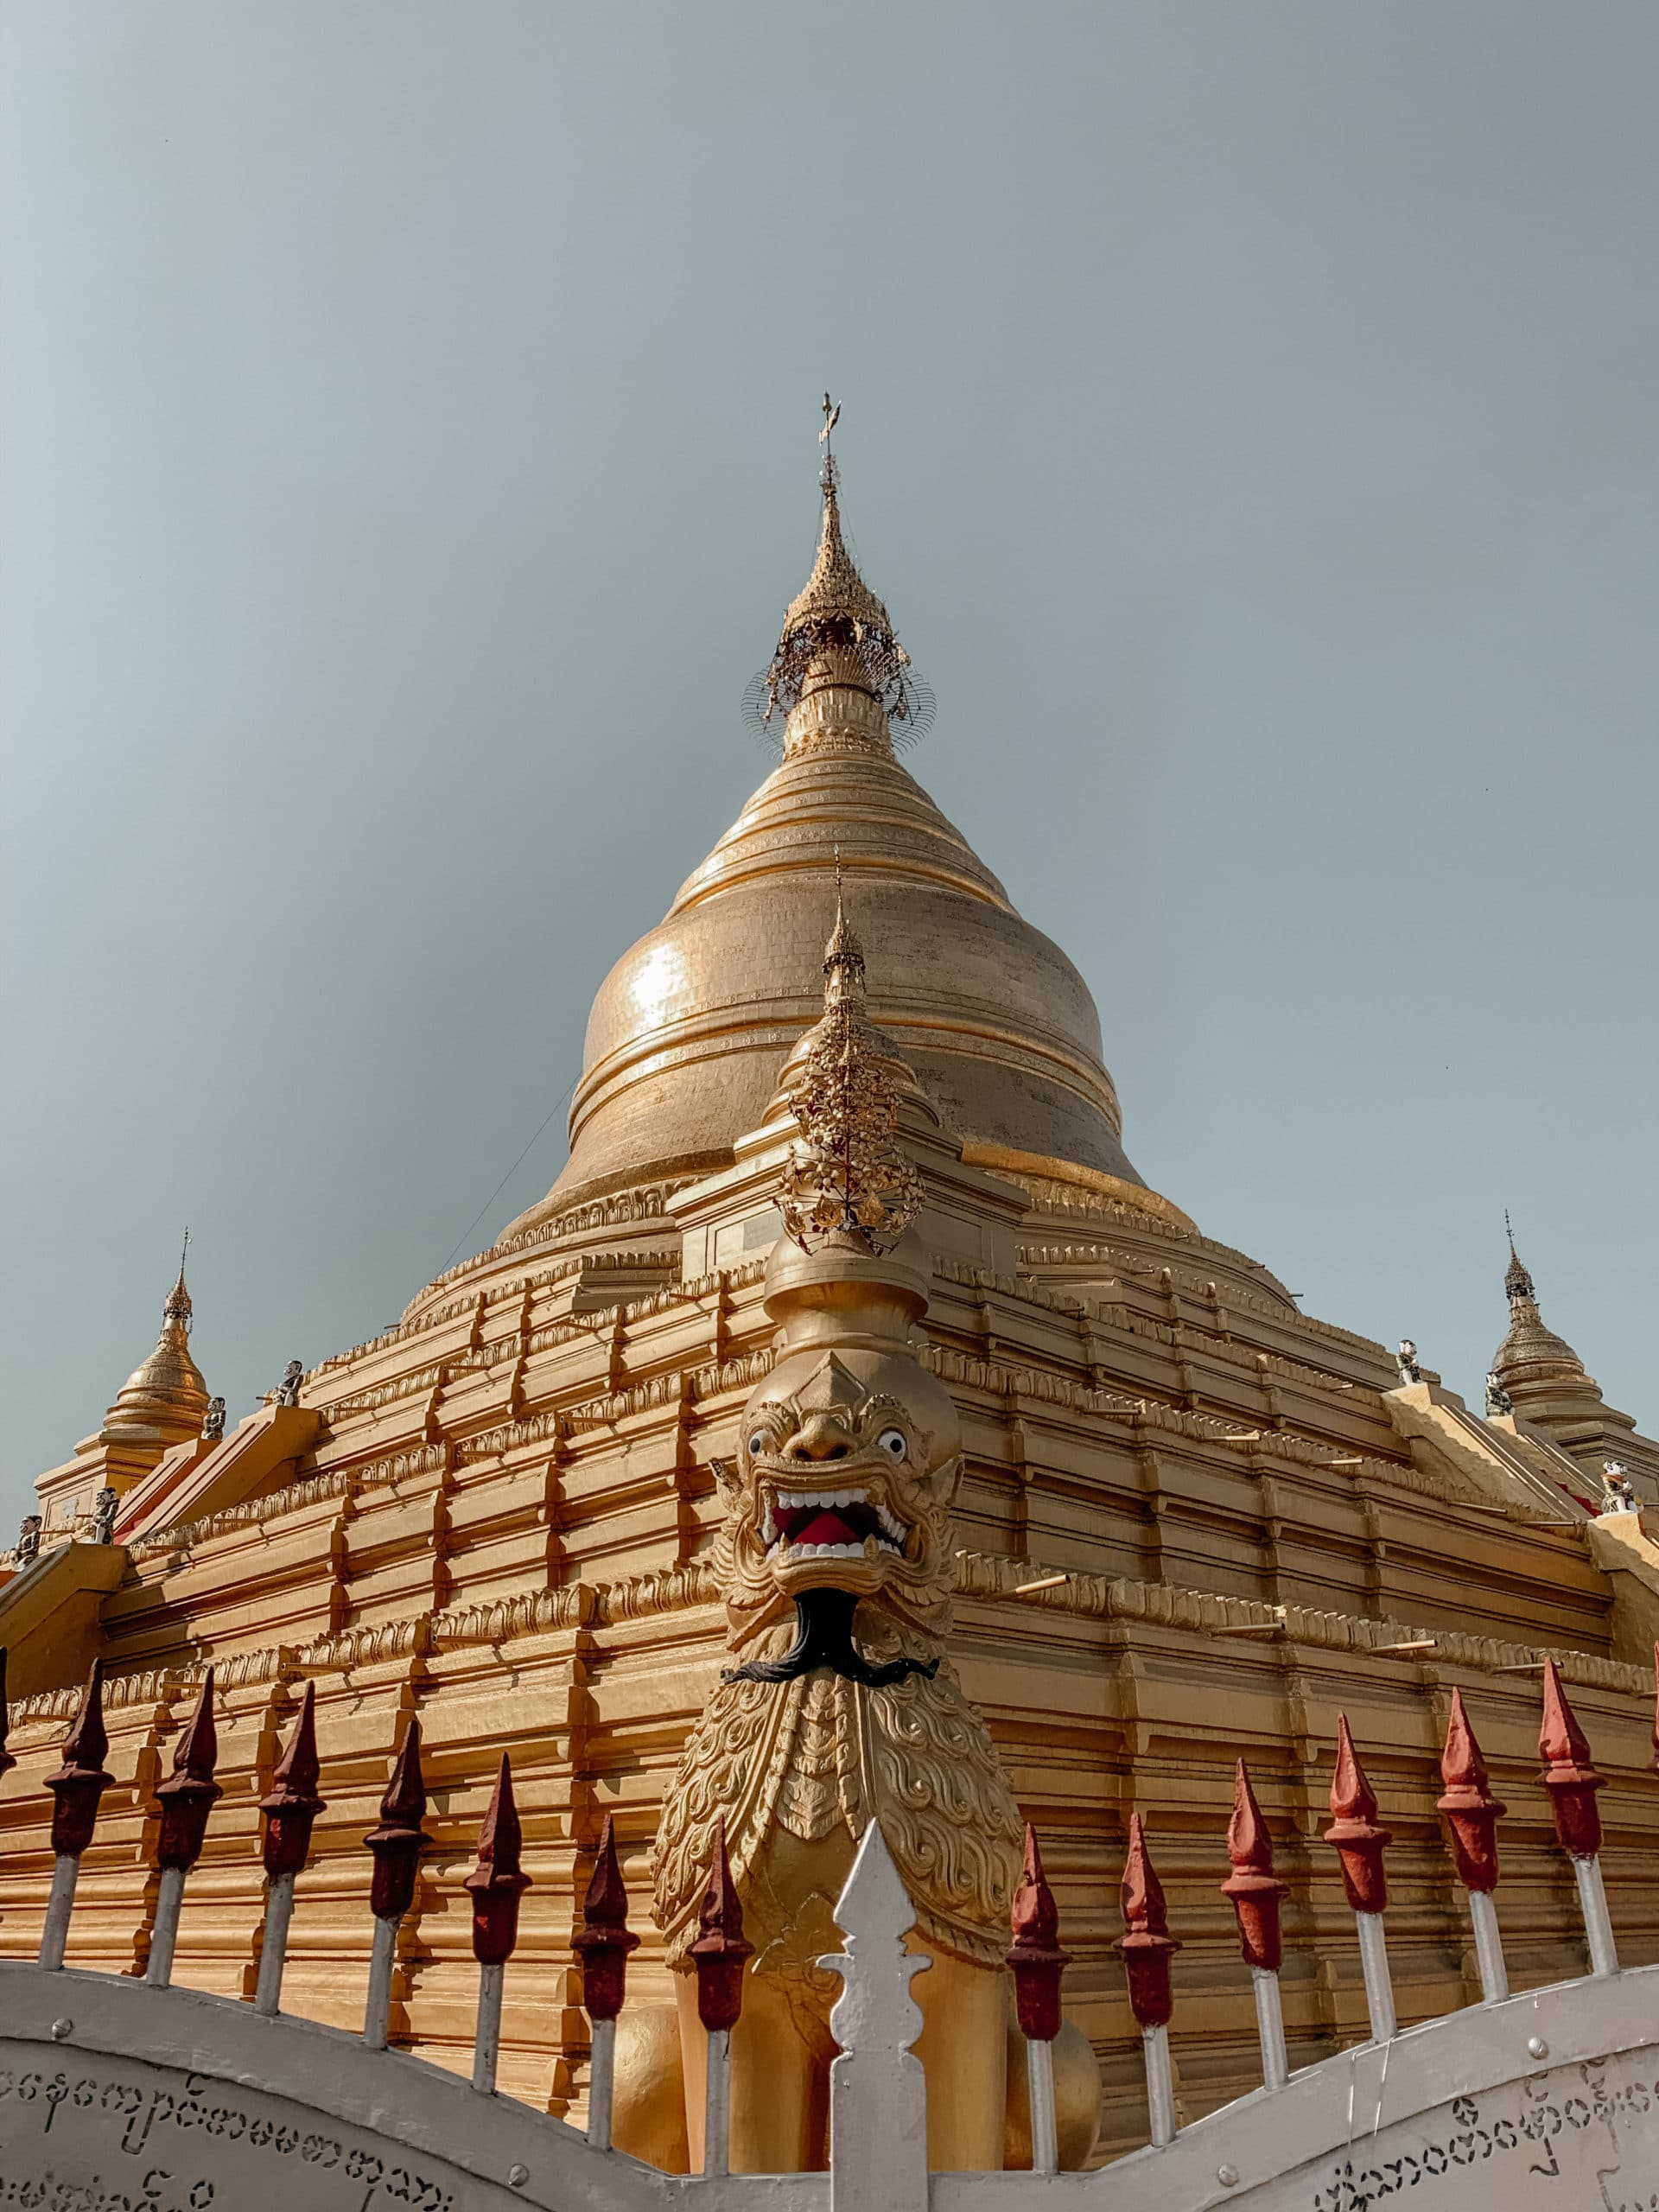 Sehenswürdigkeiten Mandalay goldene pagode